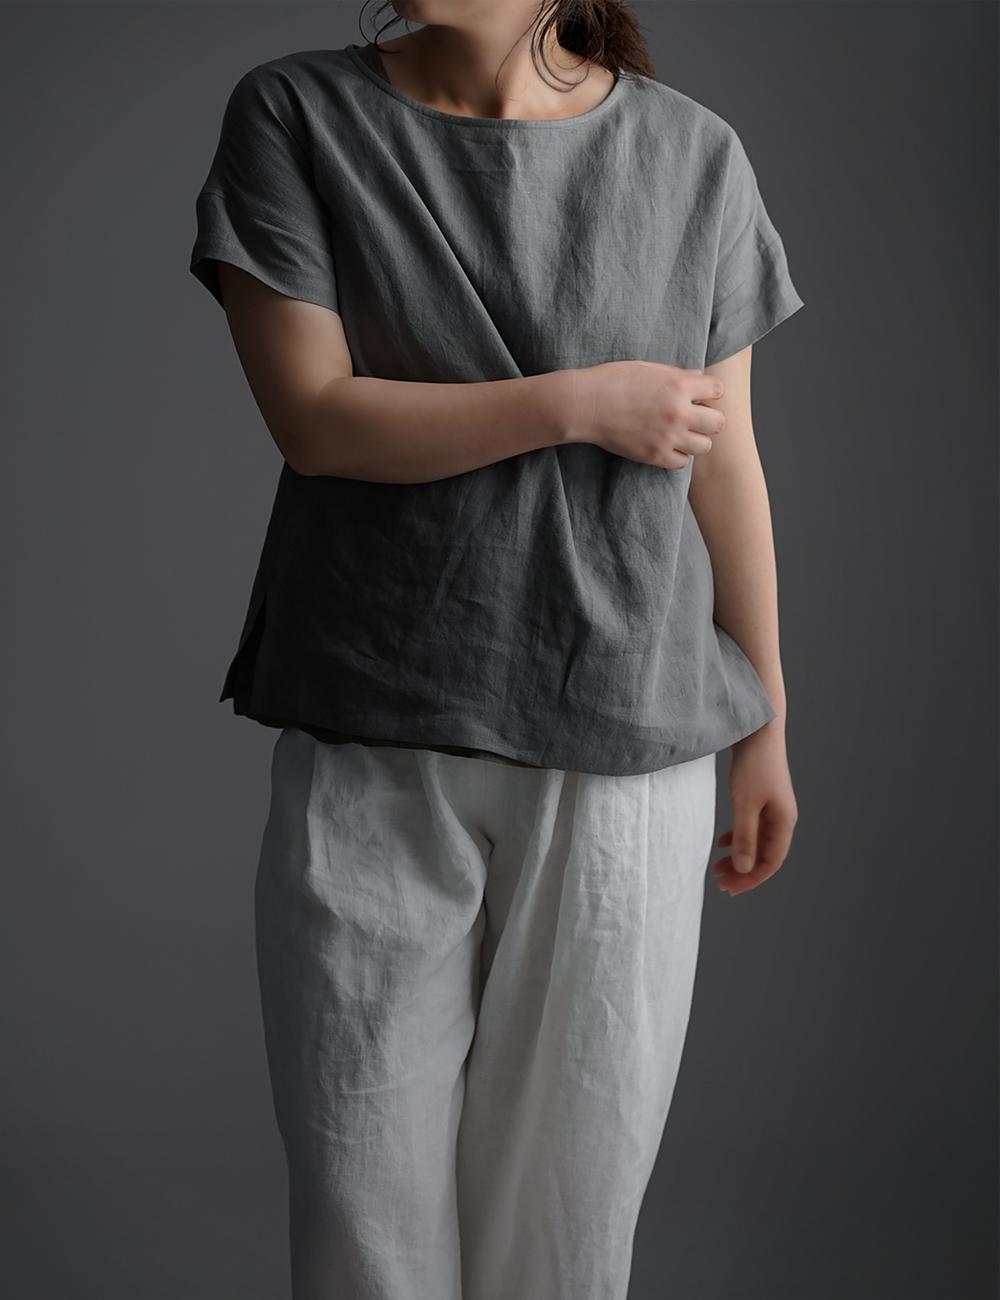 【wafu】Linen T-shirt ドロップショルダー Tシャツ /鈍色(にびいろ) t001l-nib1